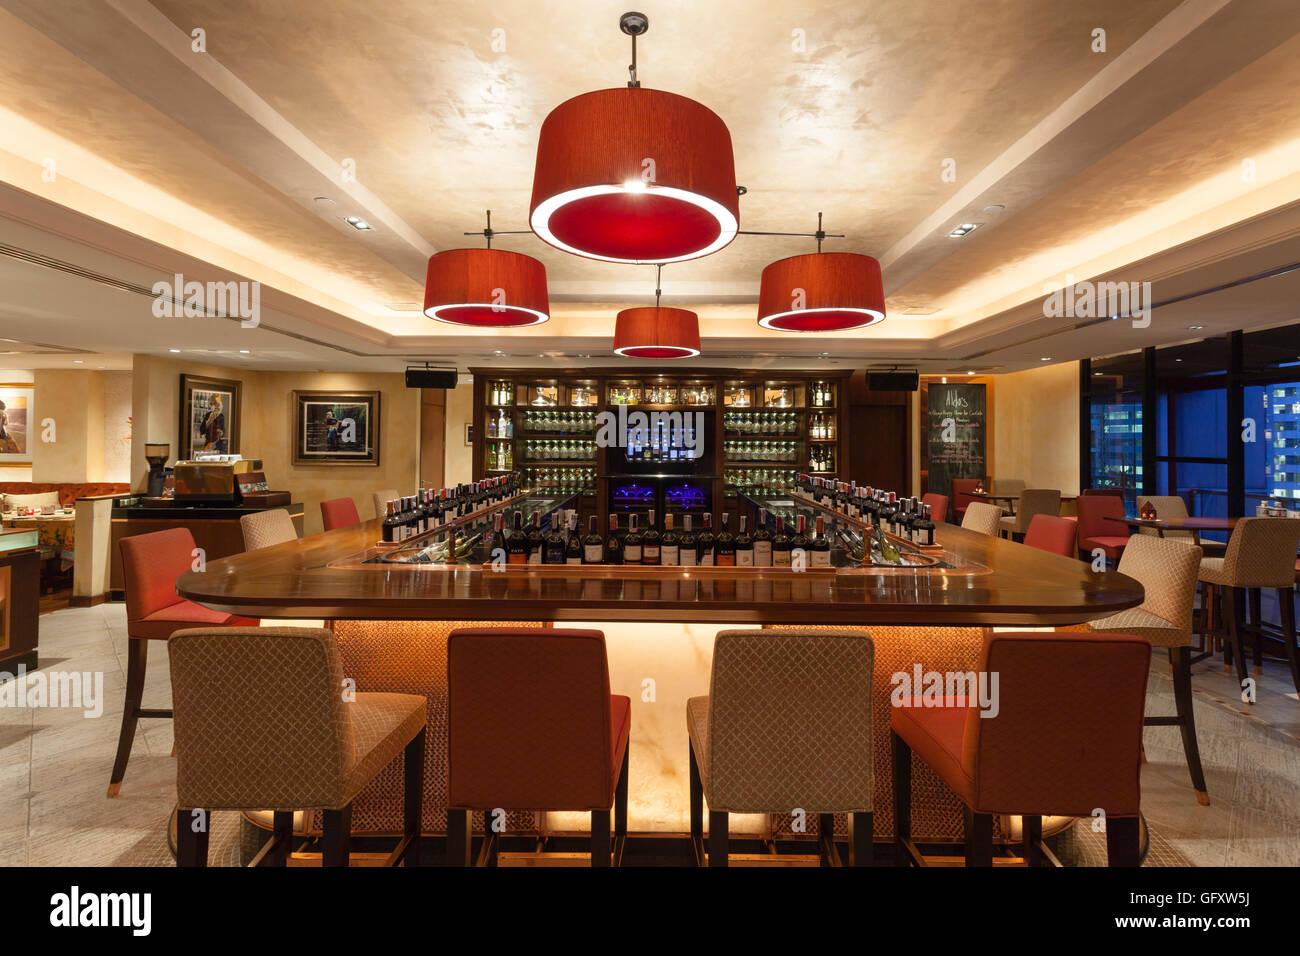 Aldo's Mediterranean Bistro and Wine Bar restaurant located in Bangkok, Thailand. - Stock Image